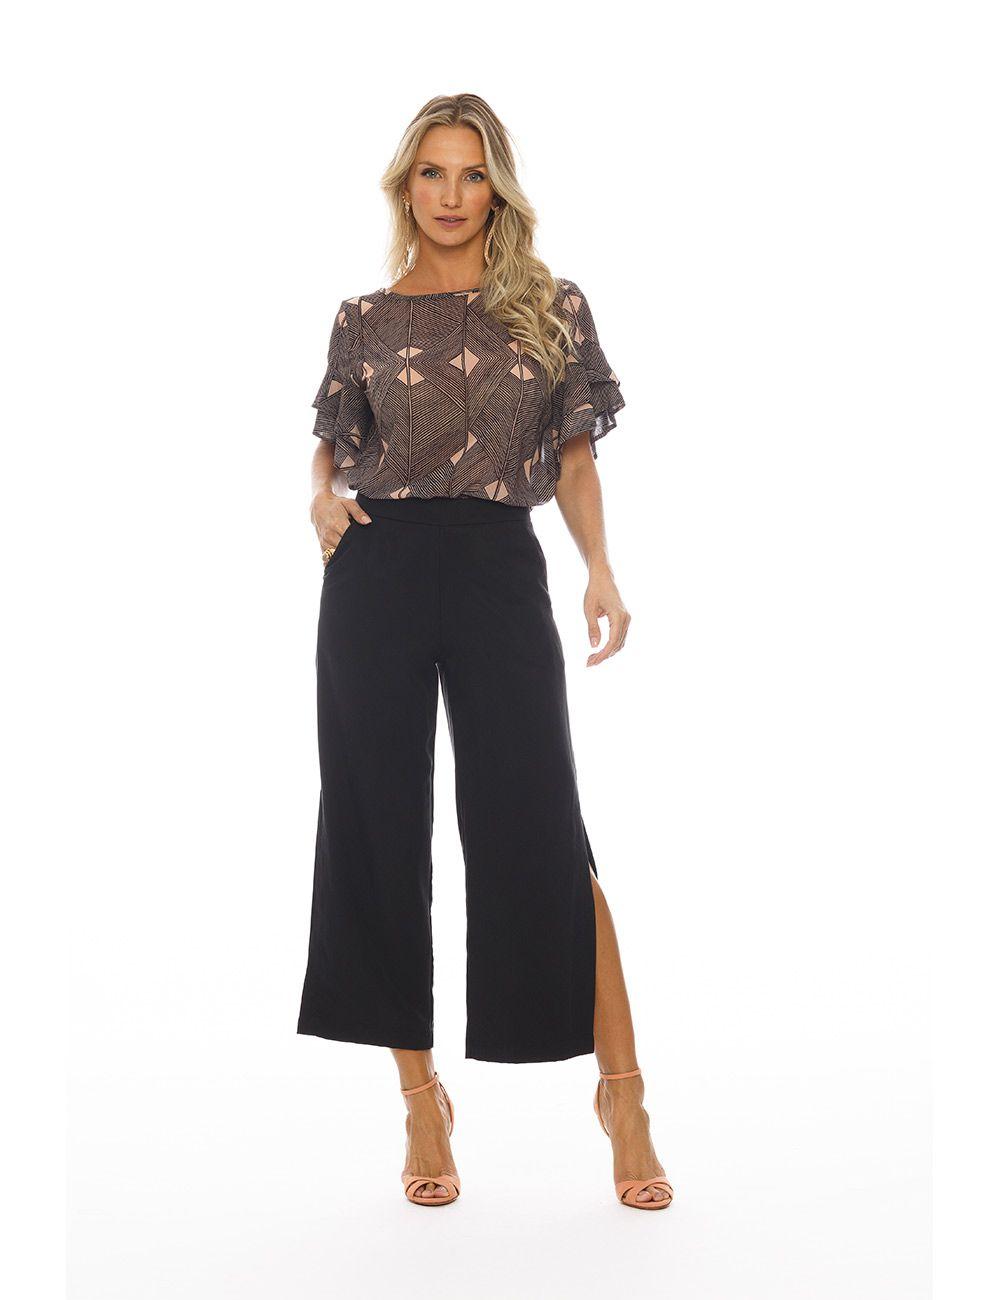 pantalona lyocell peletizado cós médio